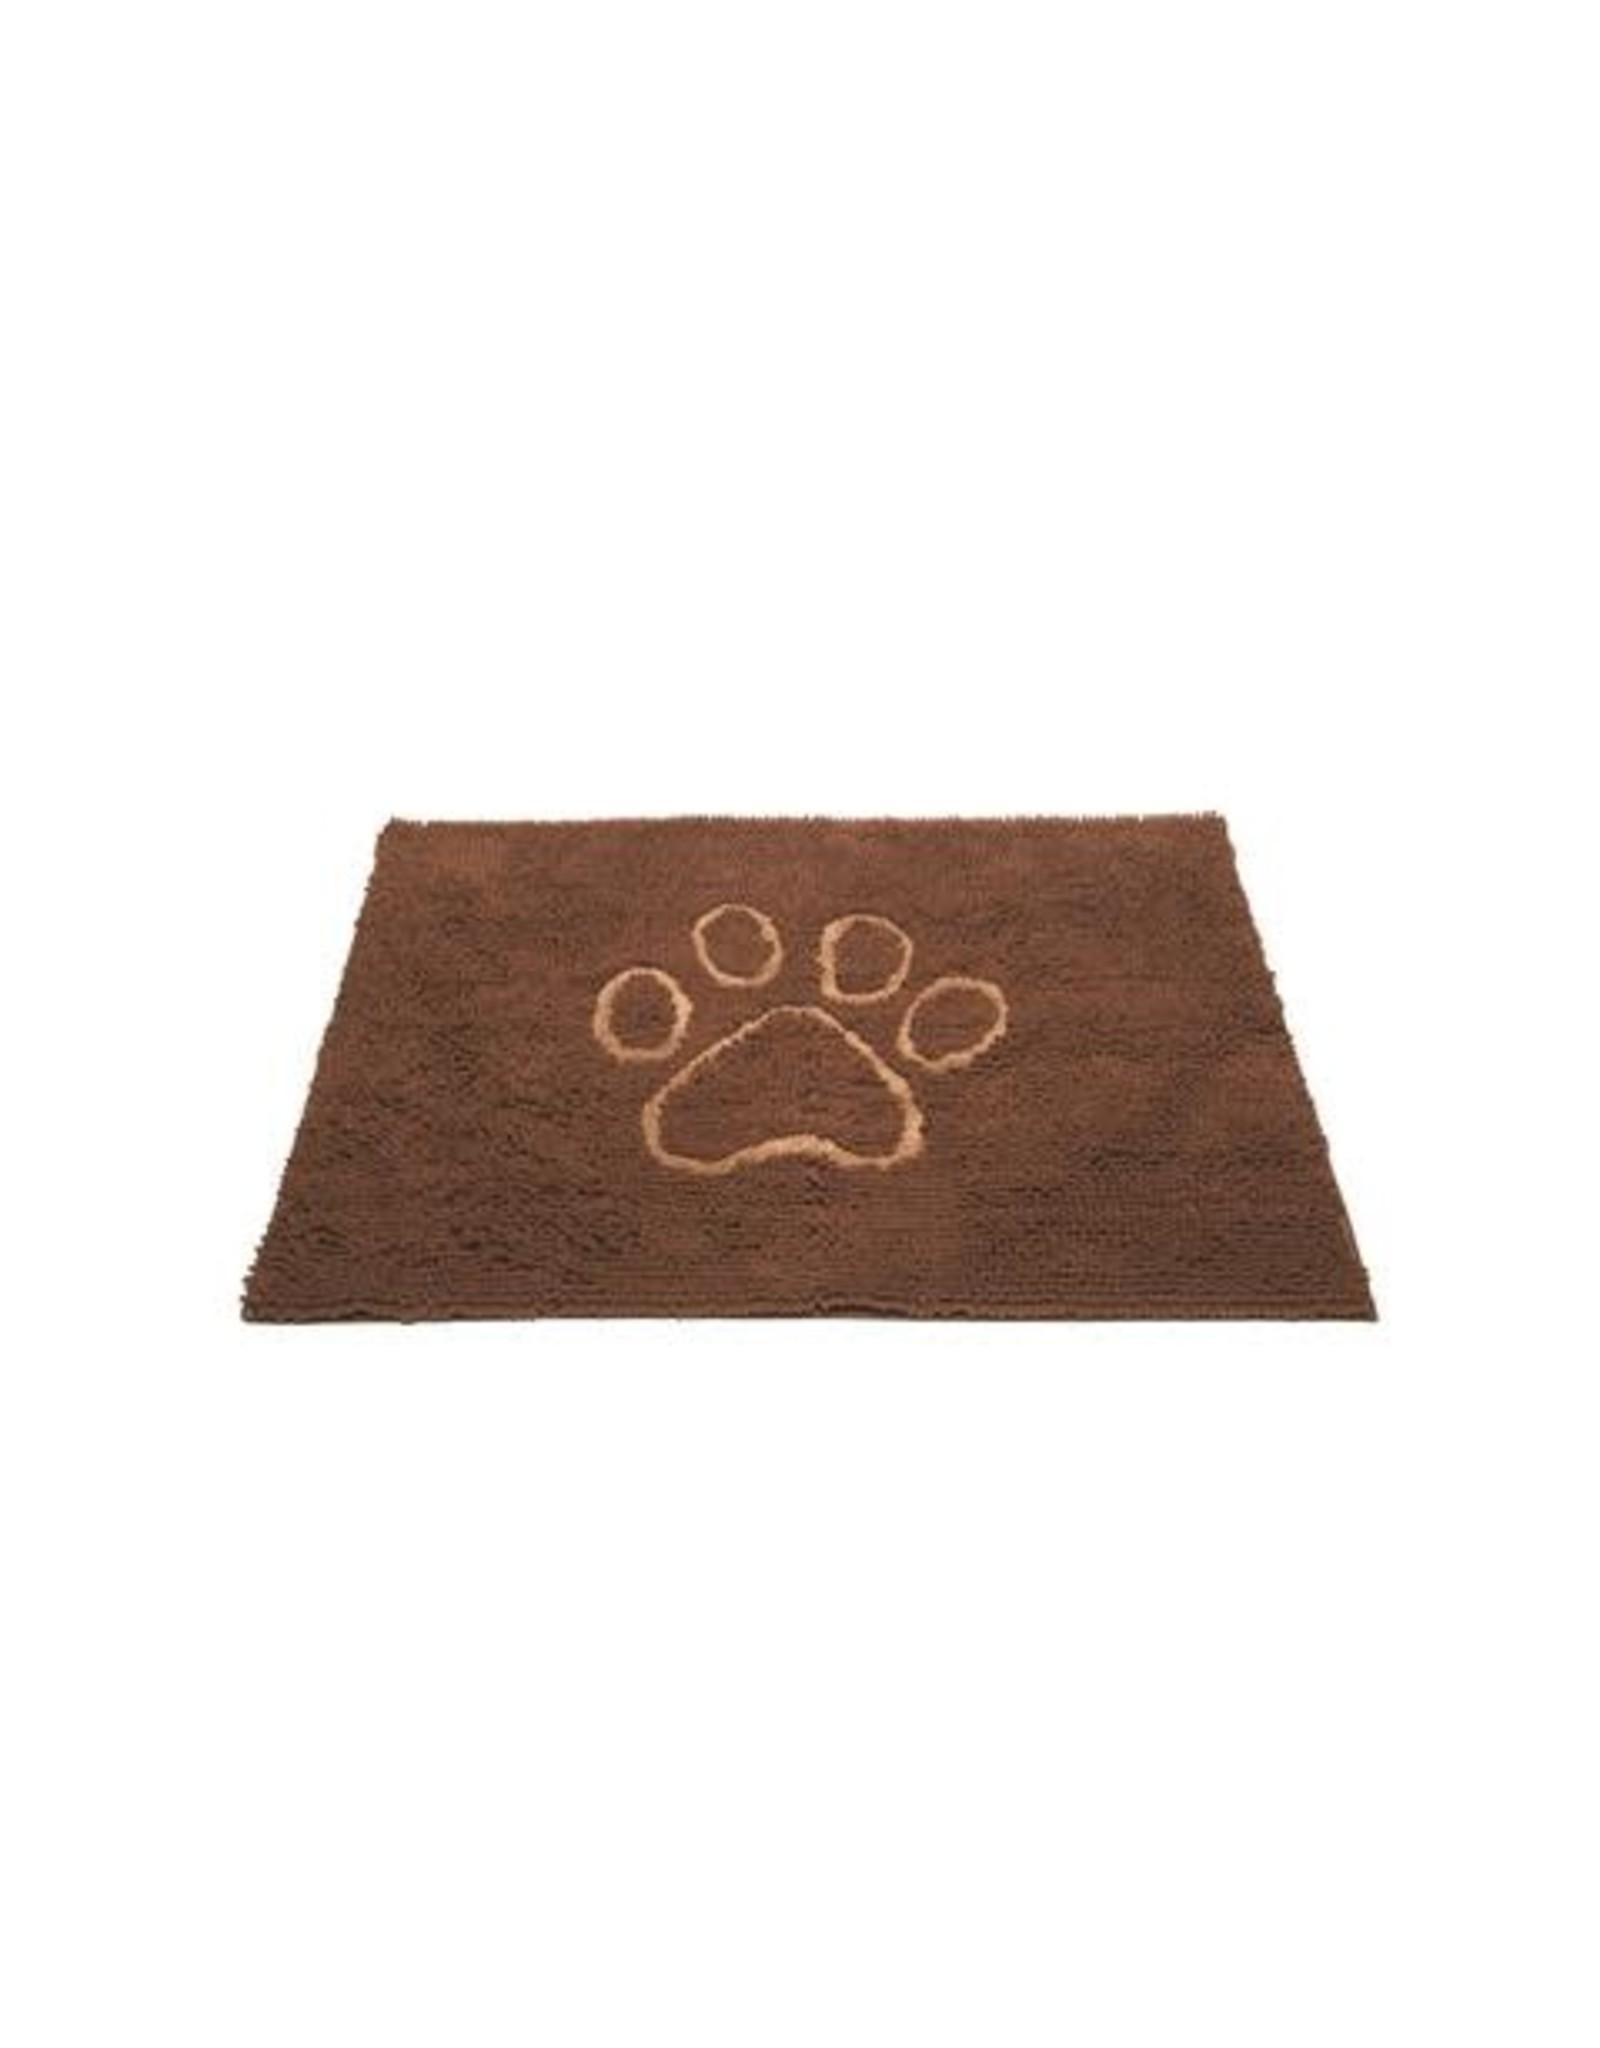 Dog Gone Smart DGS / Dirty Dog Doormat / Large 26 x 35 / Brown